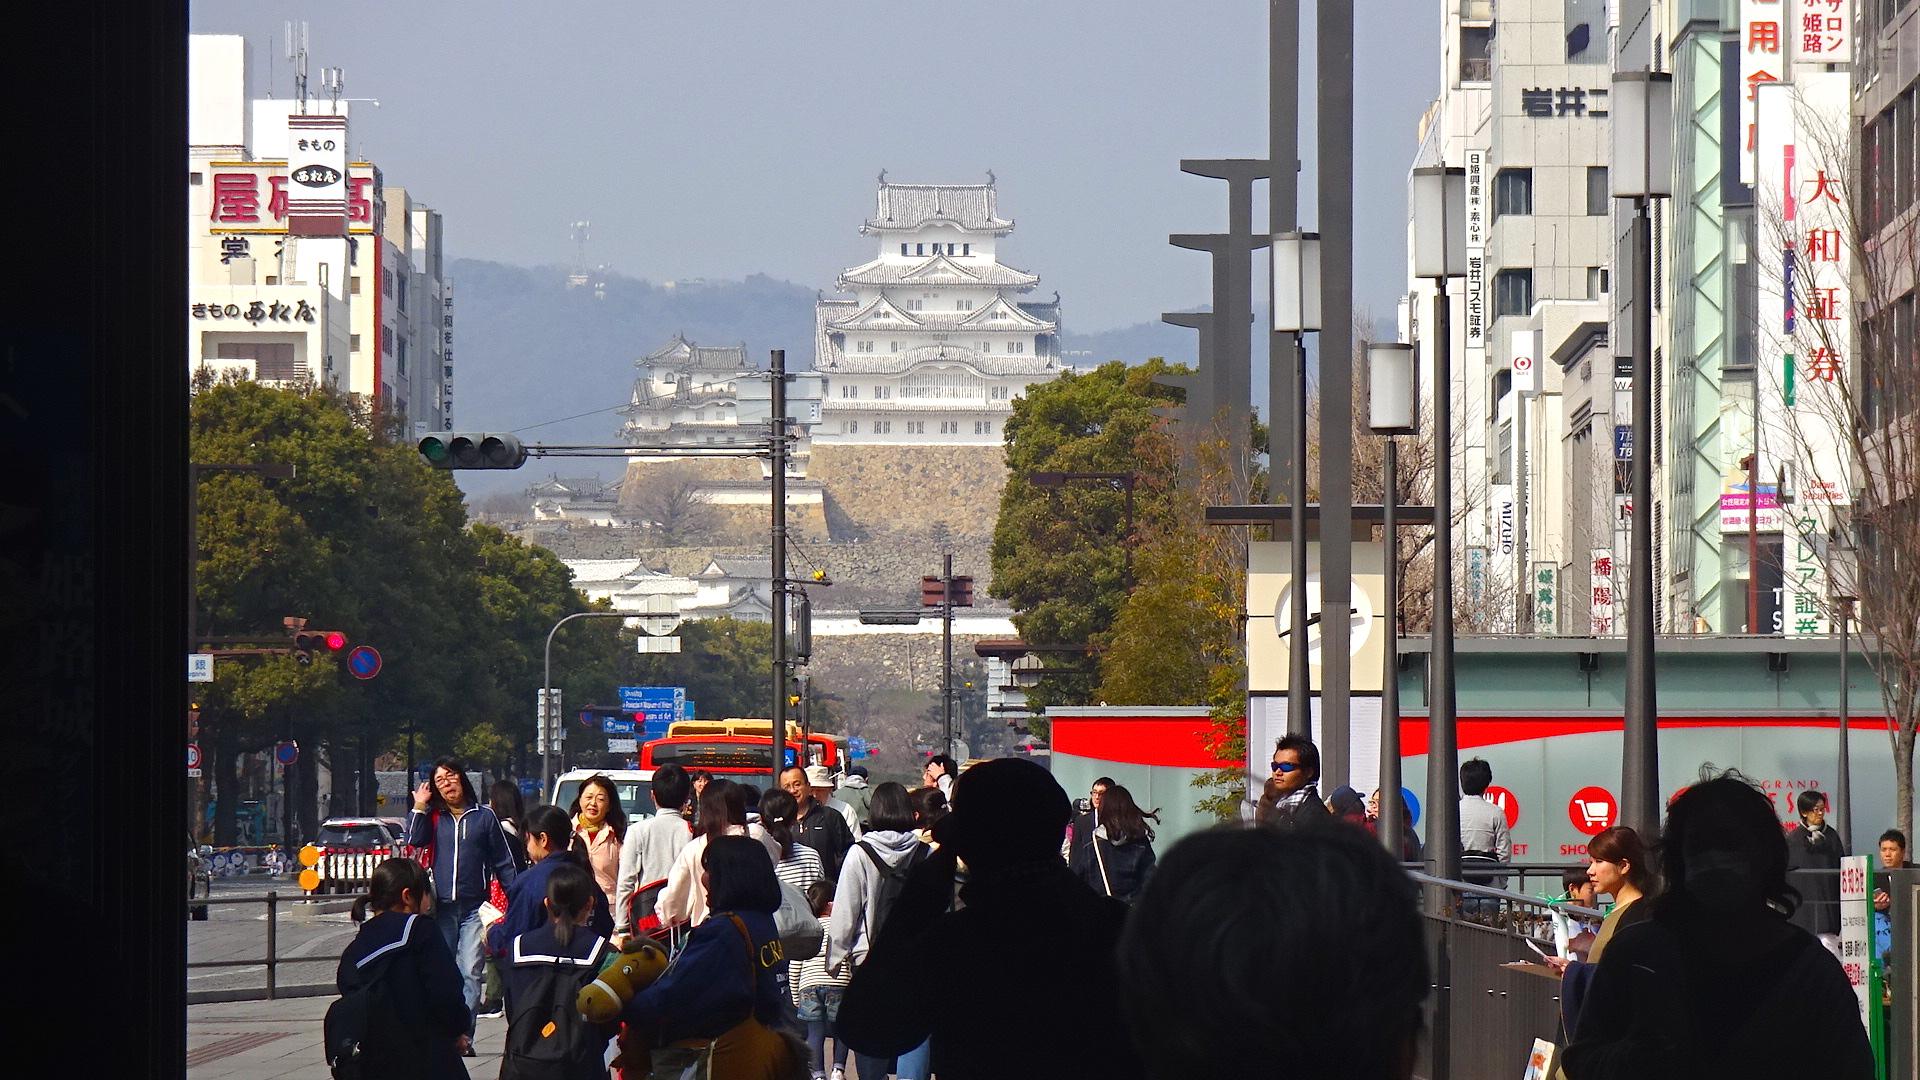 http://cdn-ak.f.st-hatena.com/images/fotolife/s/shioshiohida/20170329/20170329143916_original.jpg